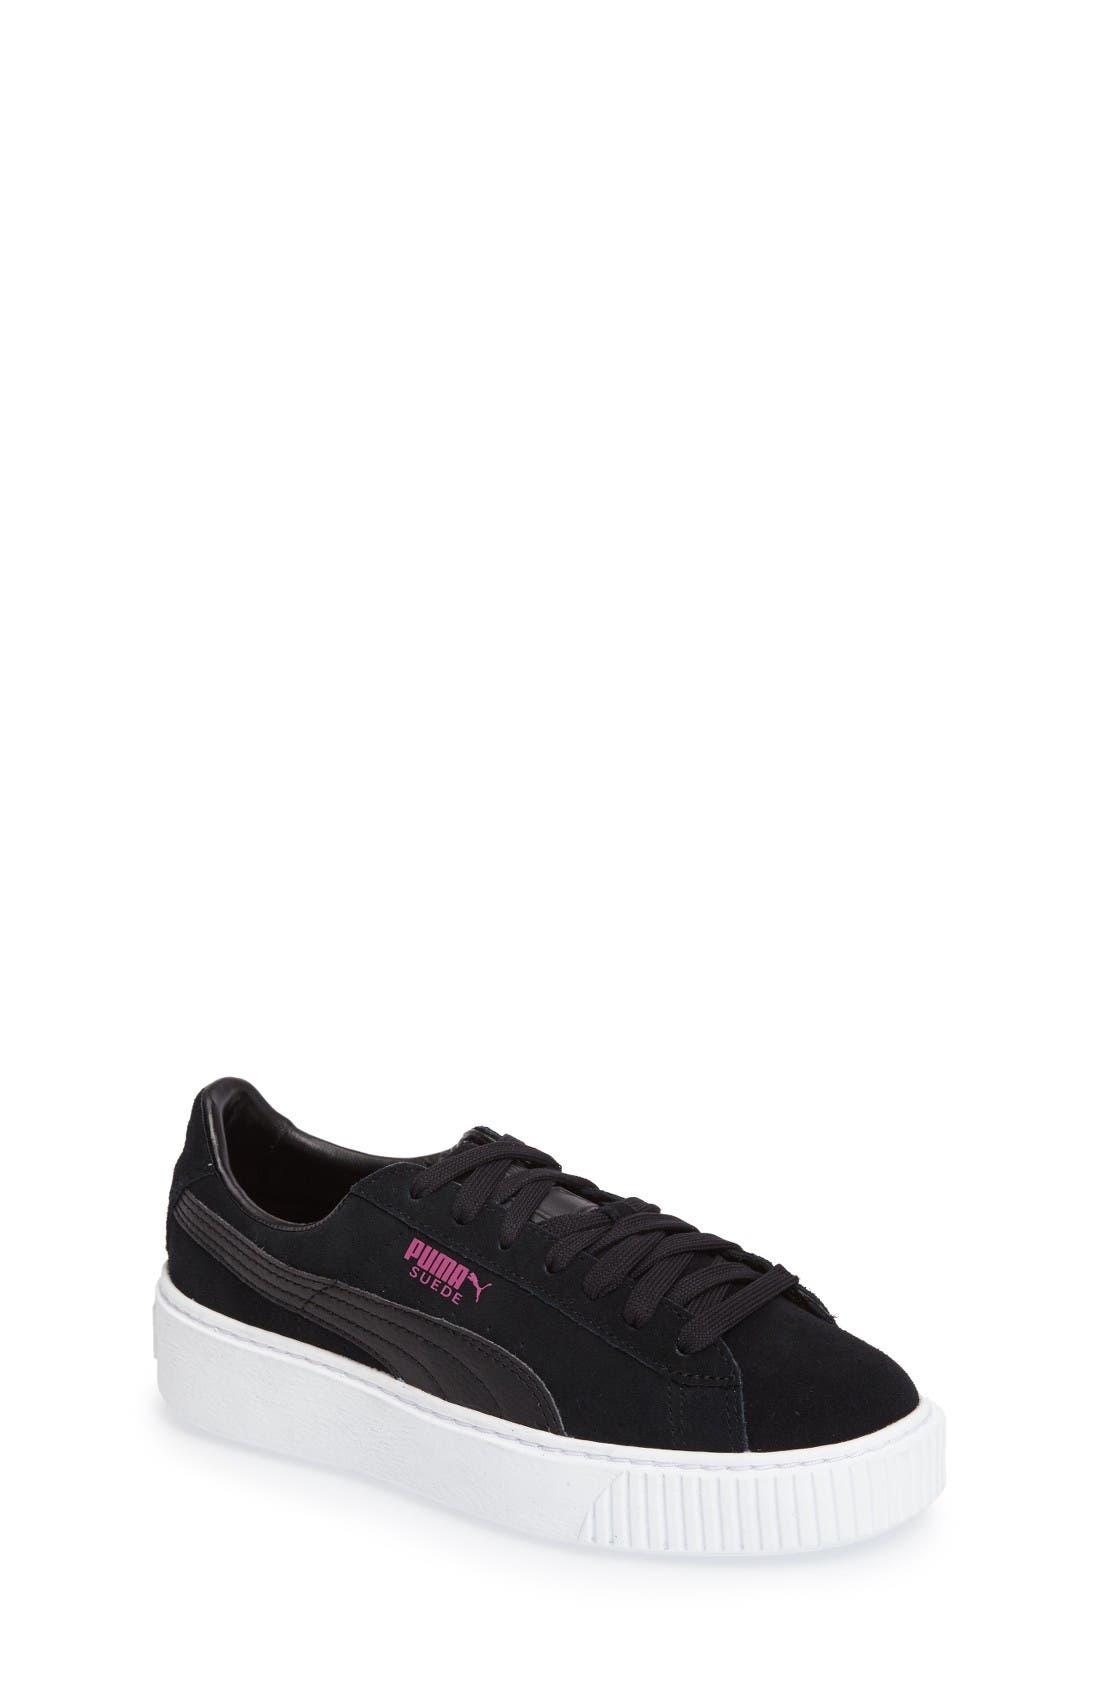 Main Image - PUMA Platform Sneaker (Big Kid)